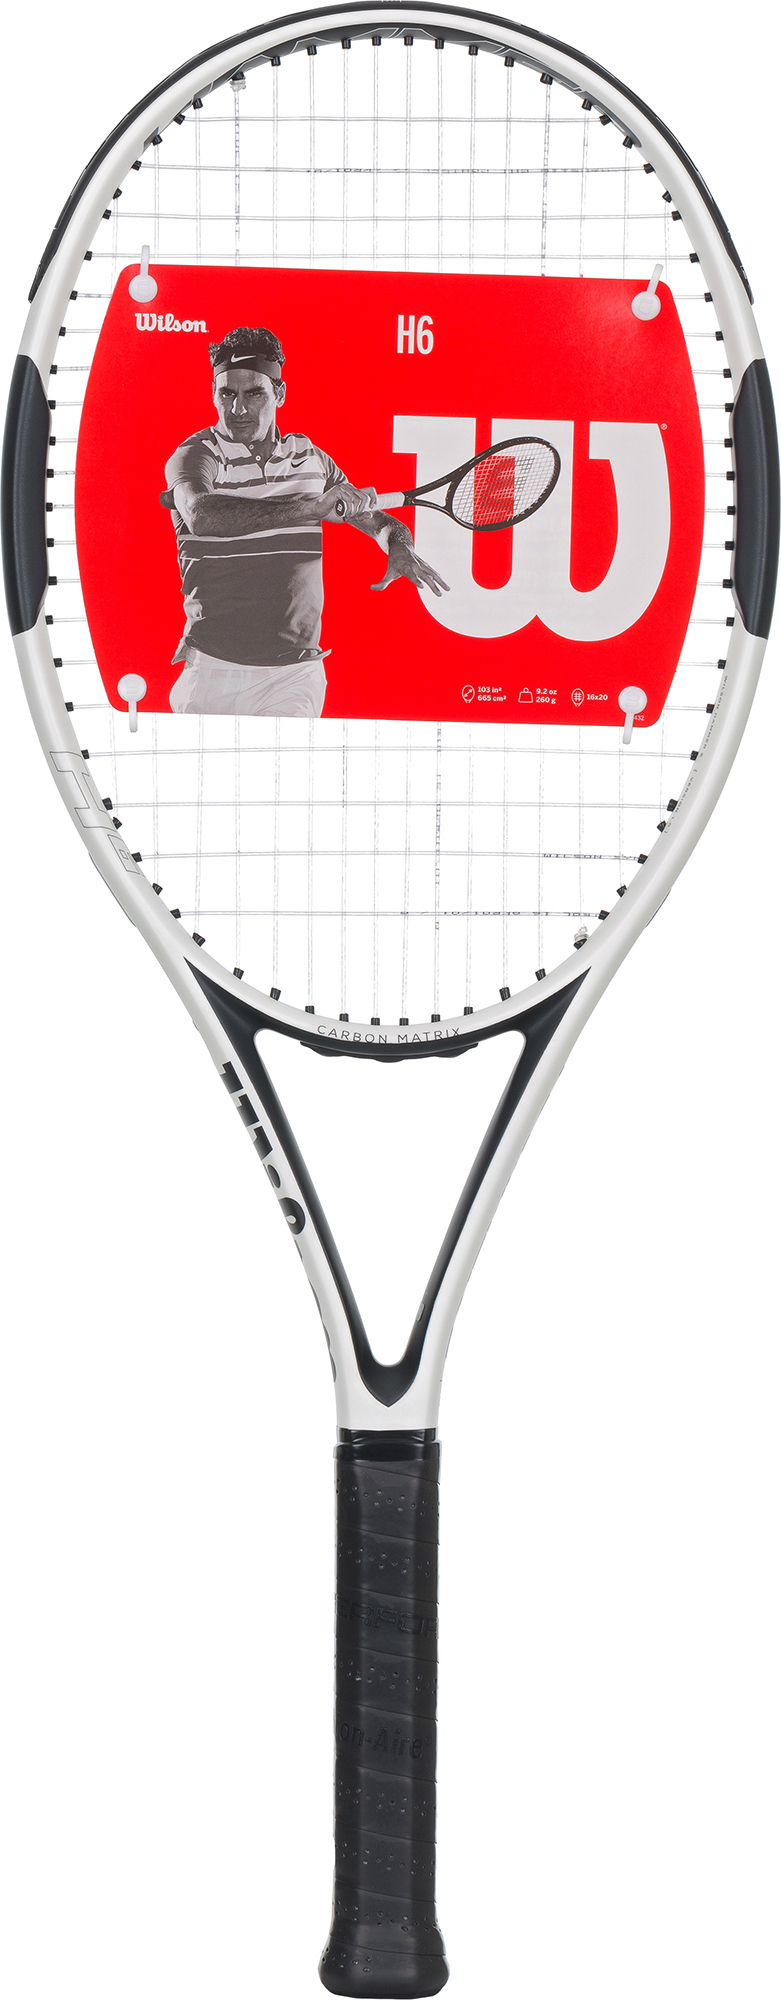 Wilson Ракетка для большого тенниса Wilson H6, размер 3 wilson набор мячей для большого тенниса wilson us open x3 размер без размера